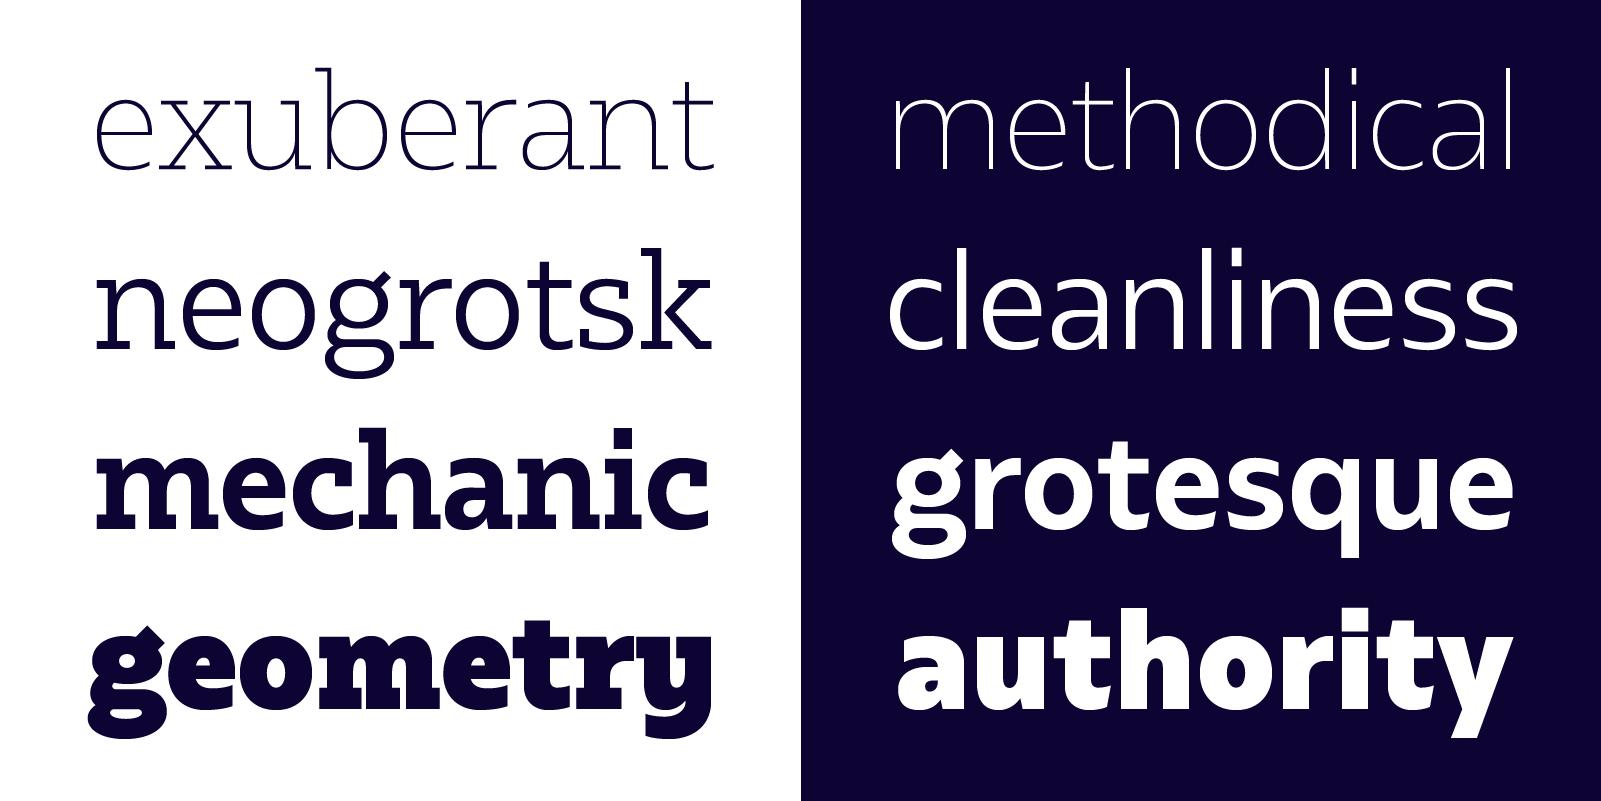 Bw Glenn Slab & Bw Glenn Sans typefaces